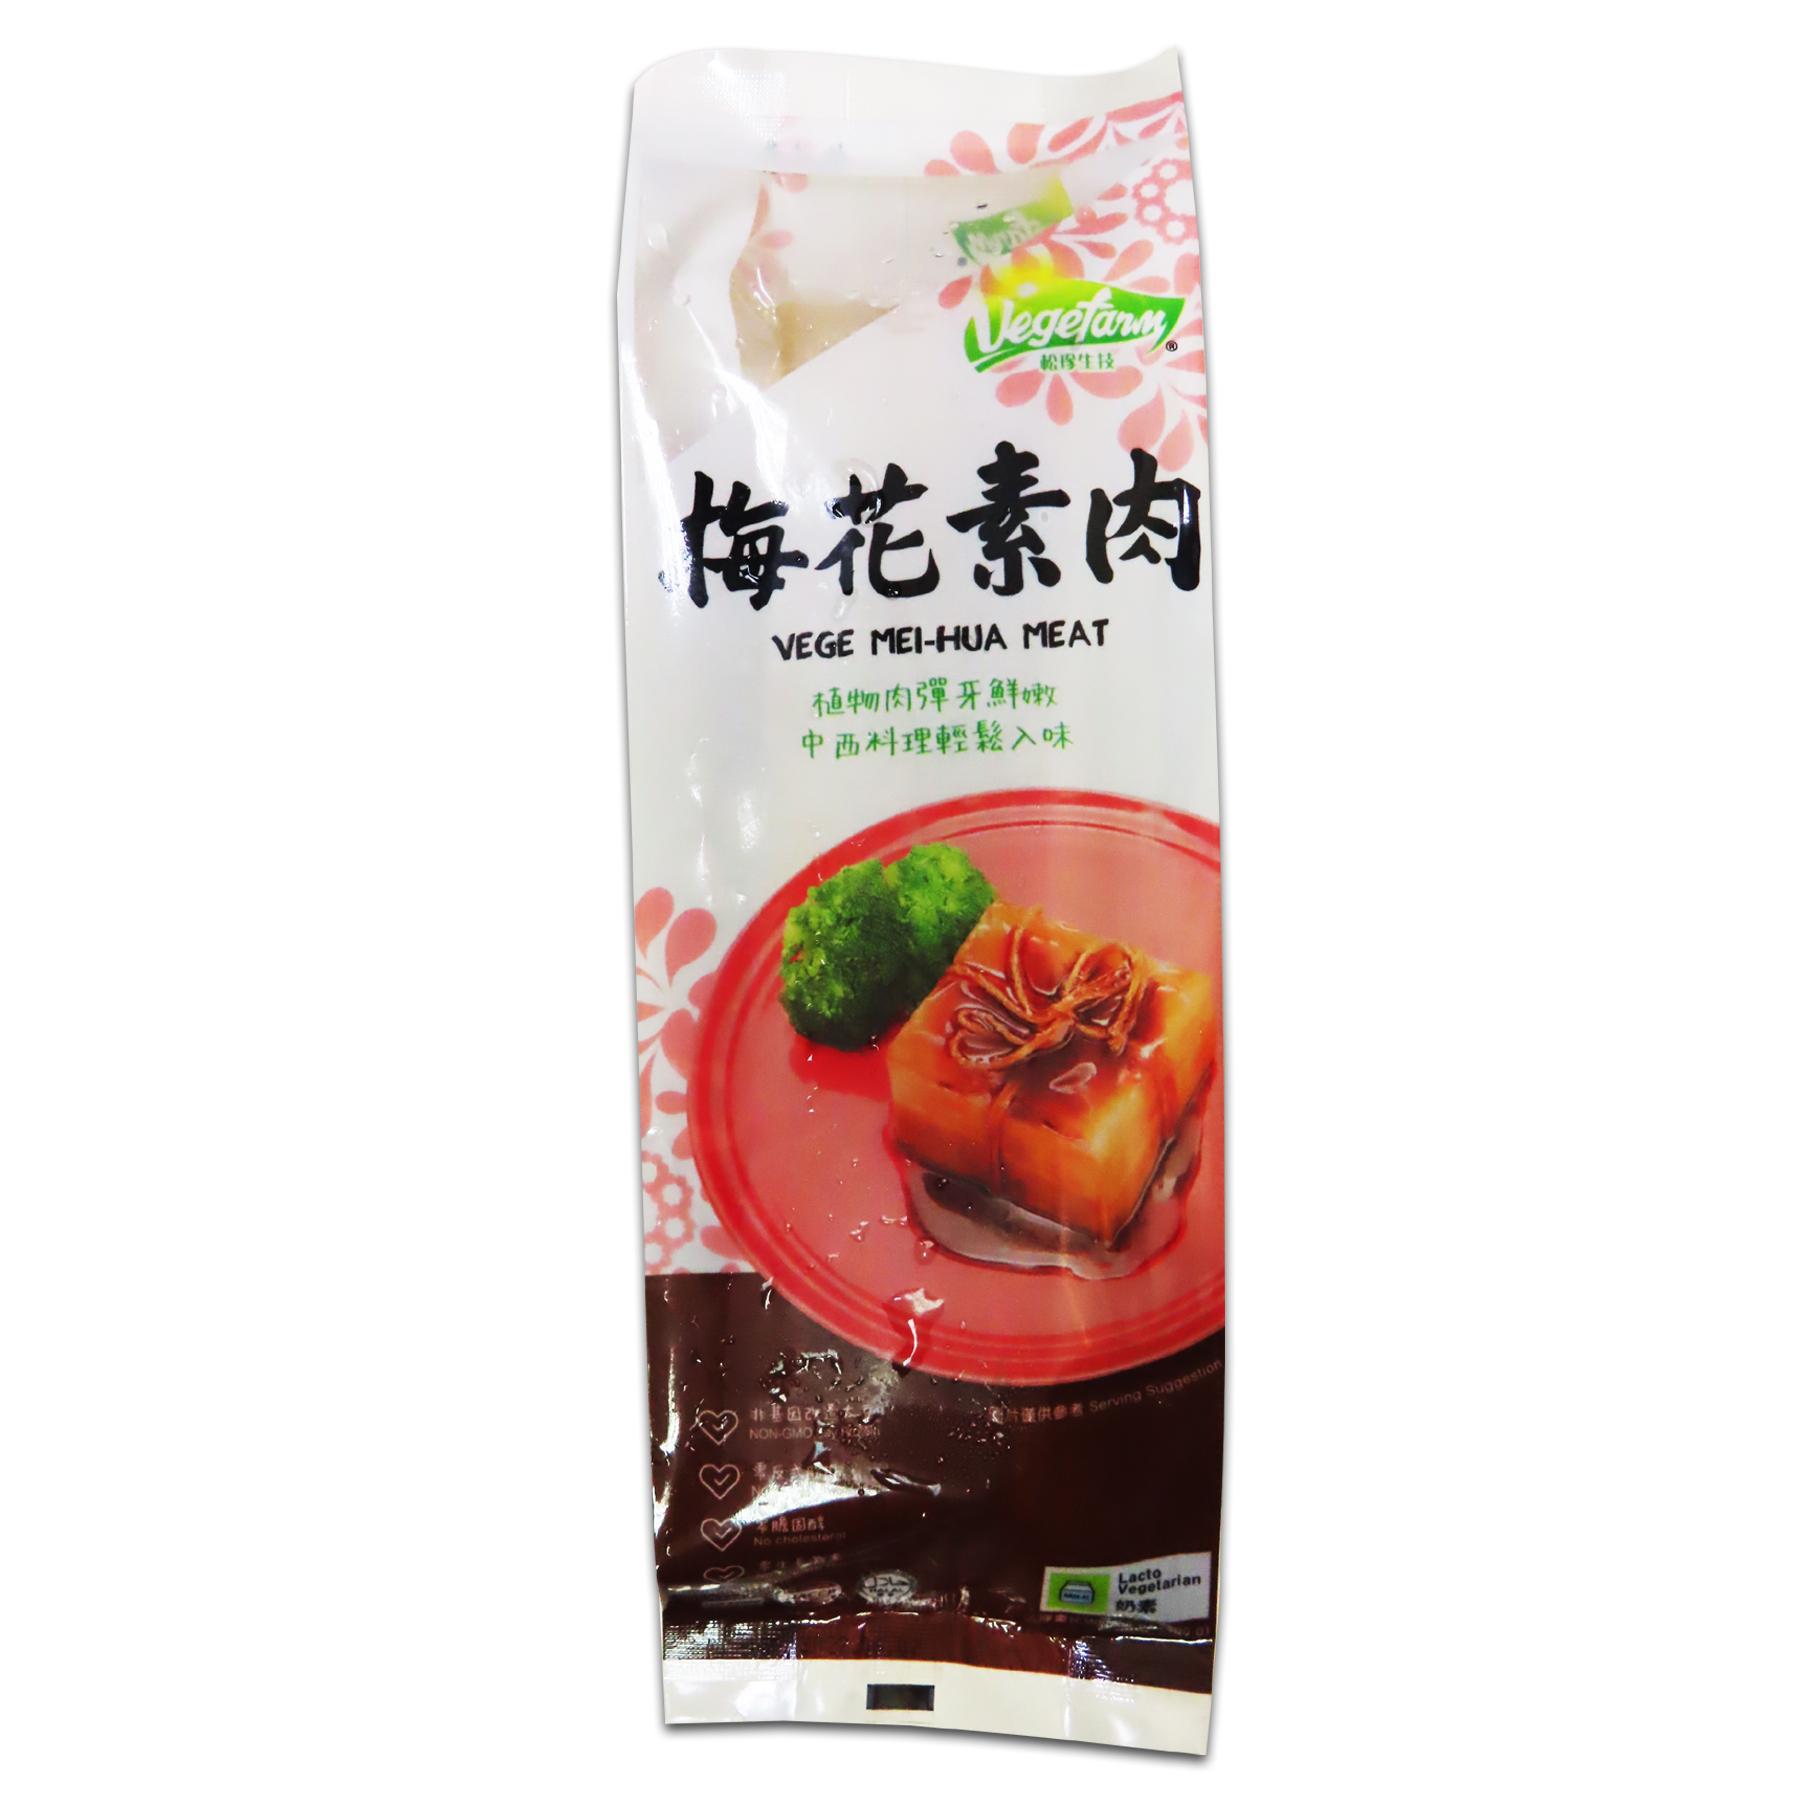 Image VegeFarm Mei-Hua Meat 松珍 - 梅花素肉 300grams